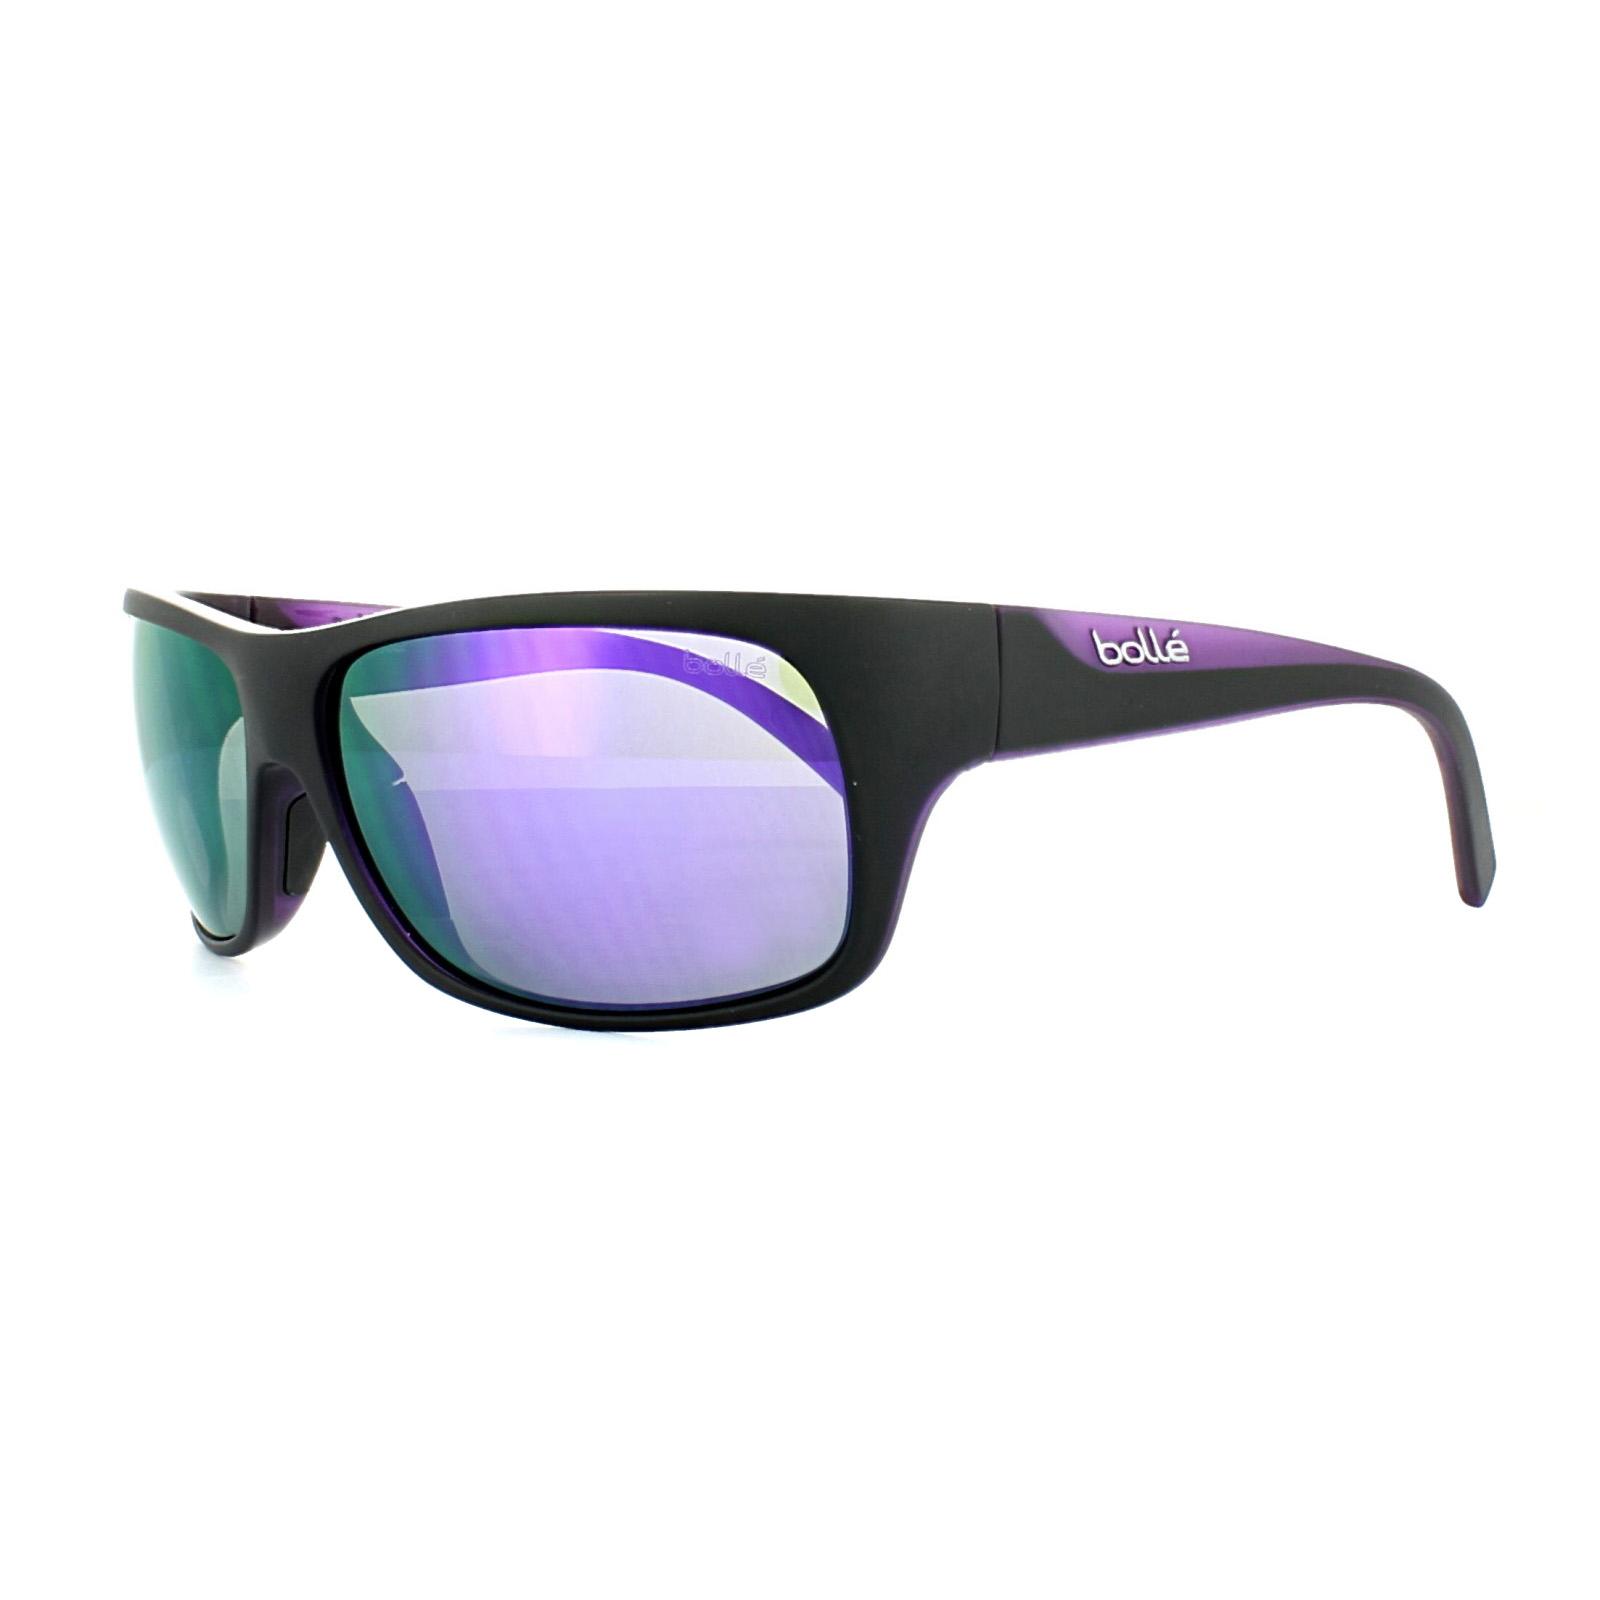 b1ac5d2e13 Sentinel Bolle Sunglasses Viper 11947 Matt Black Blue Violet Mirror